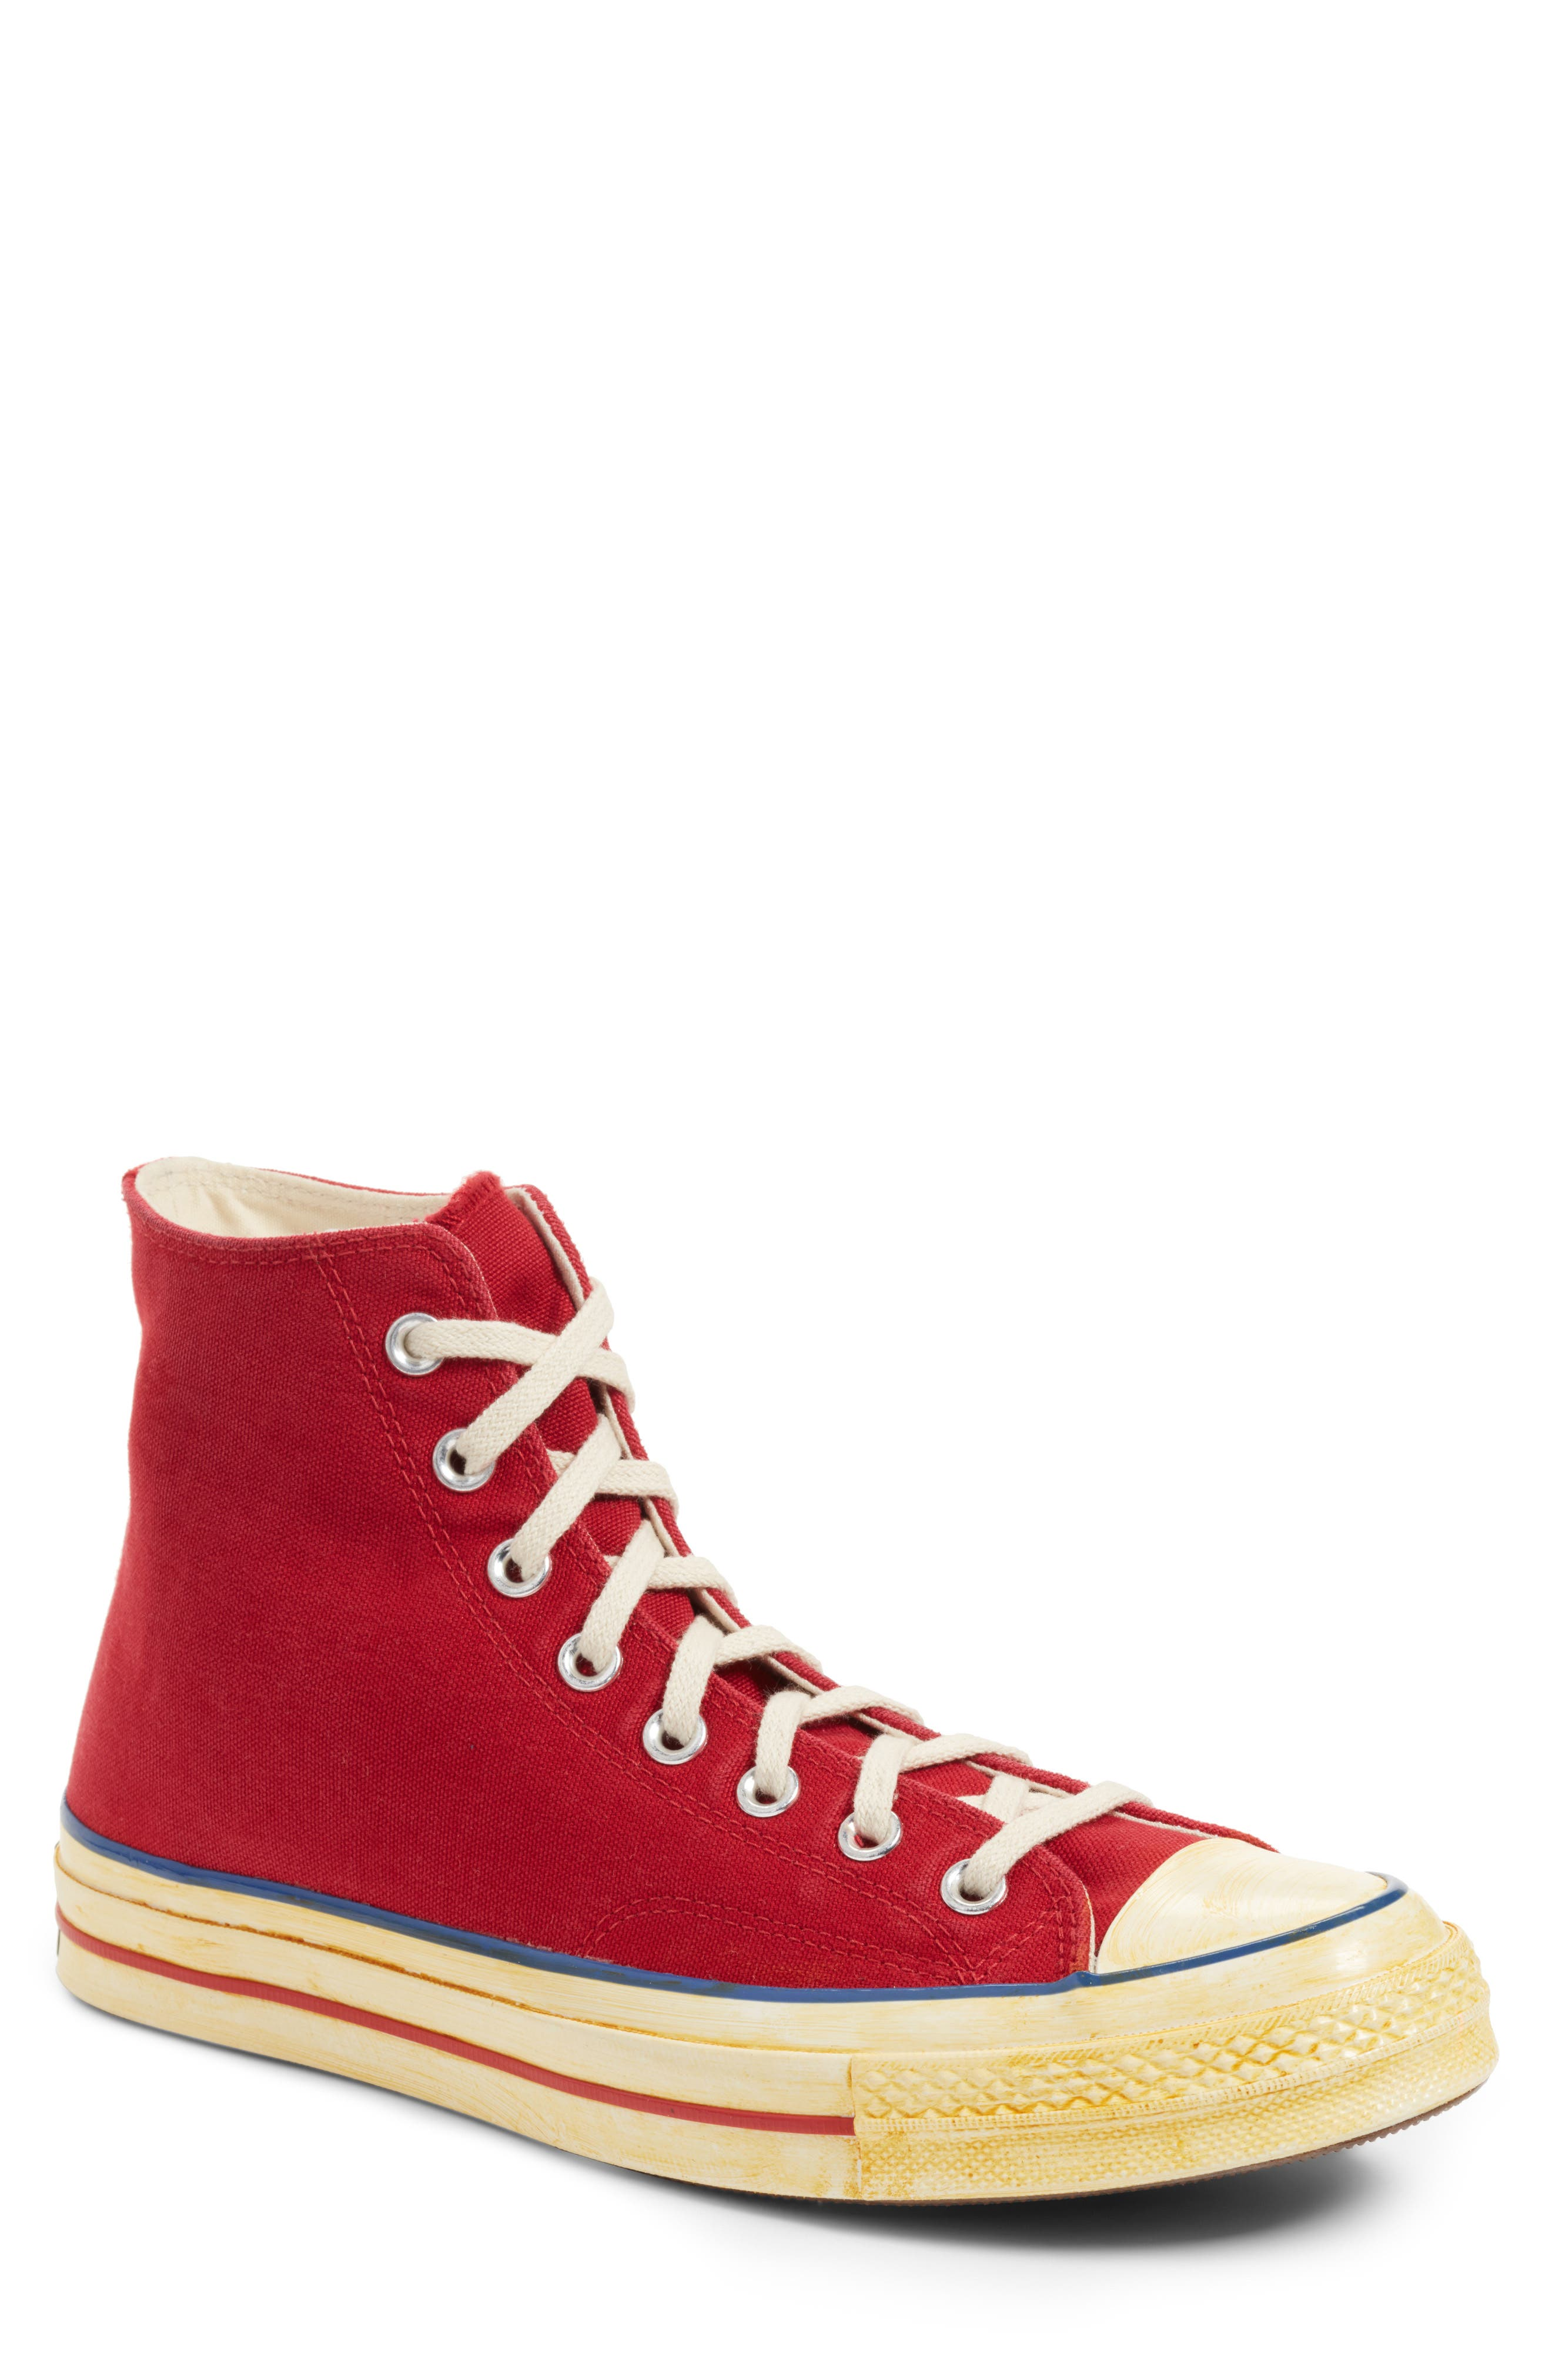 Chuck Taylor<sup>®</sup> All Star<sup>®</sup> 70 High Top Sneaker,                             Main thumbnail 1, color,                             608